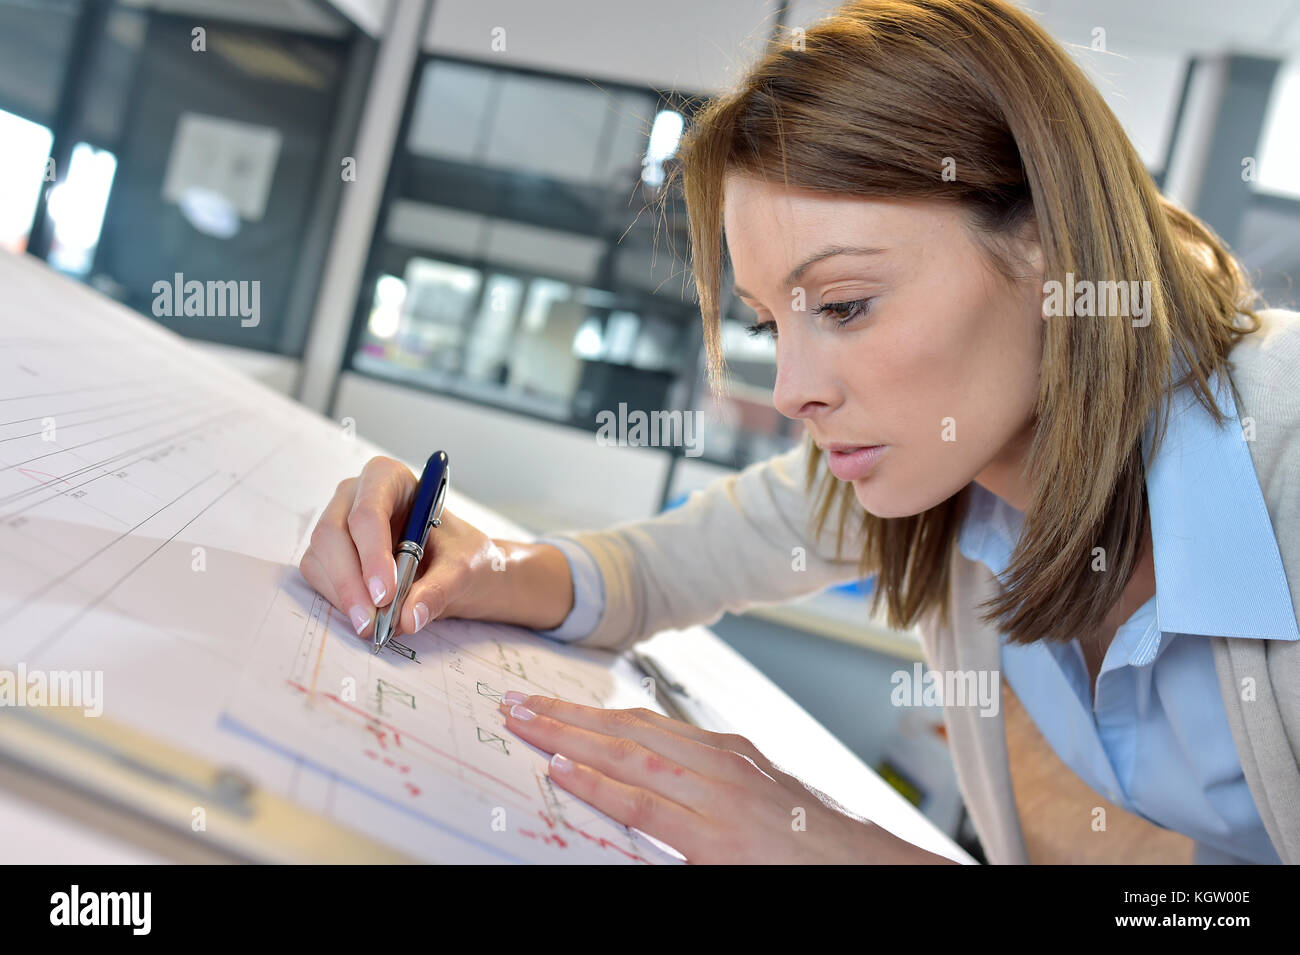 Mujer ingeniero trabajando en blueprint en Office Imagen De Stock